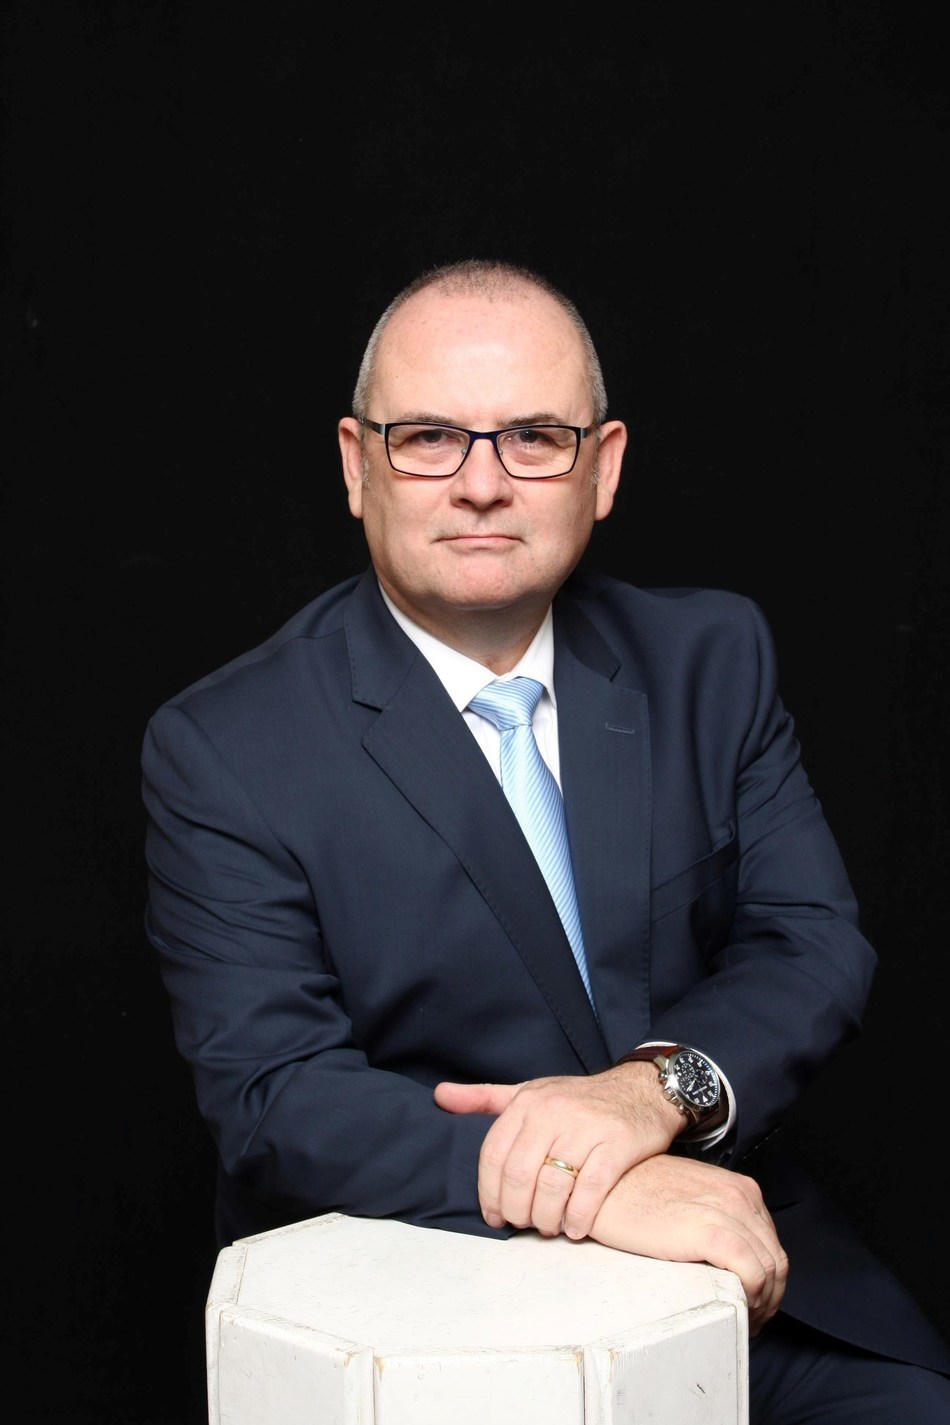 Scott Madden, Udelv VP of Sales